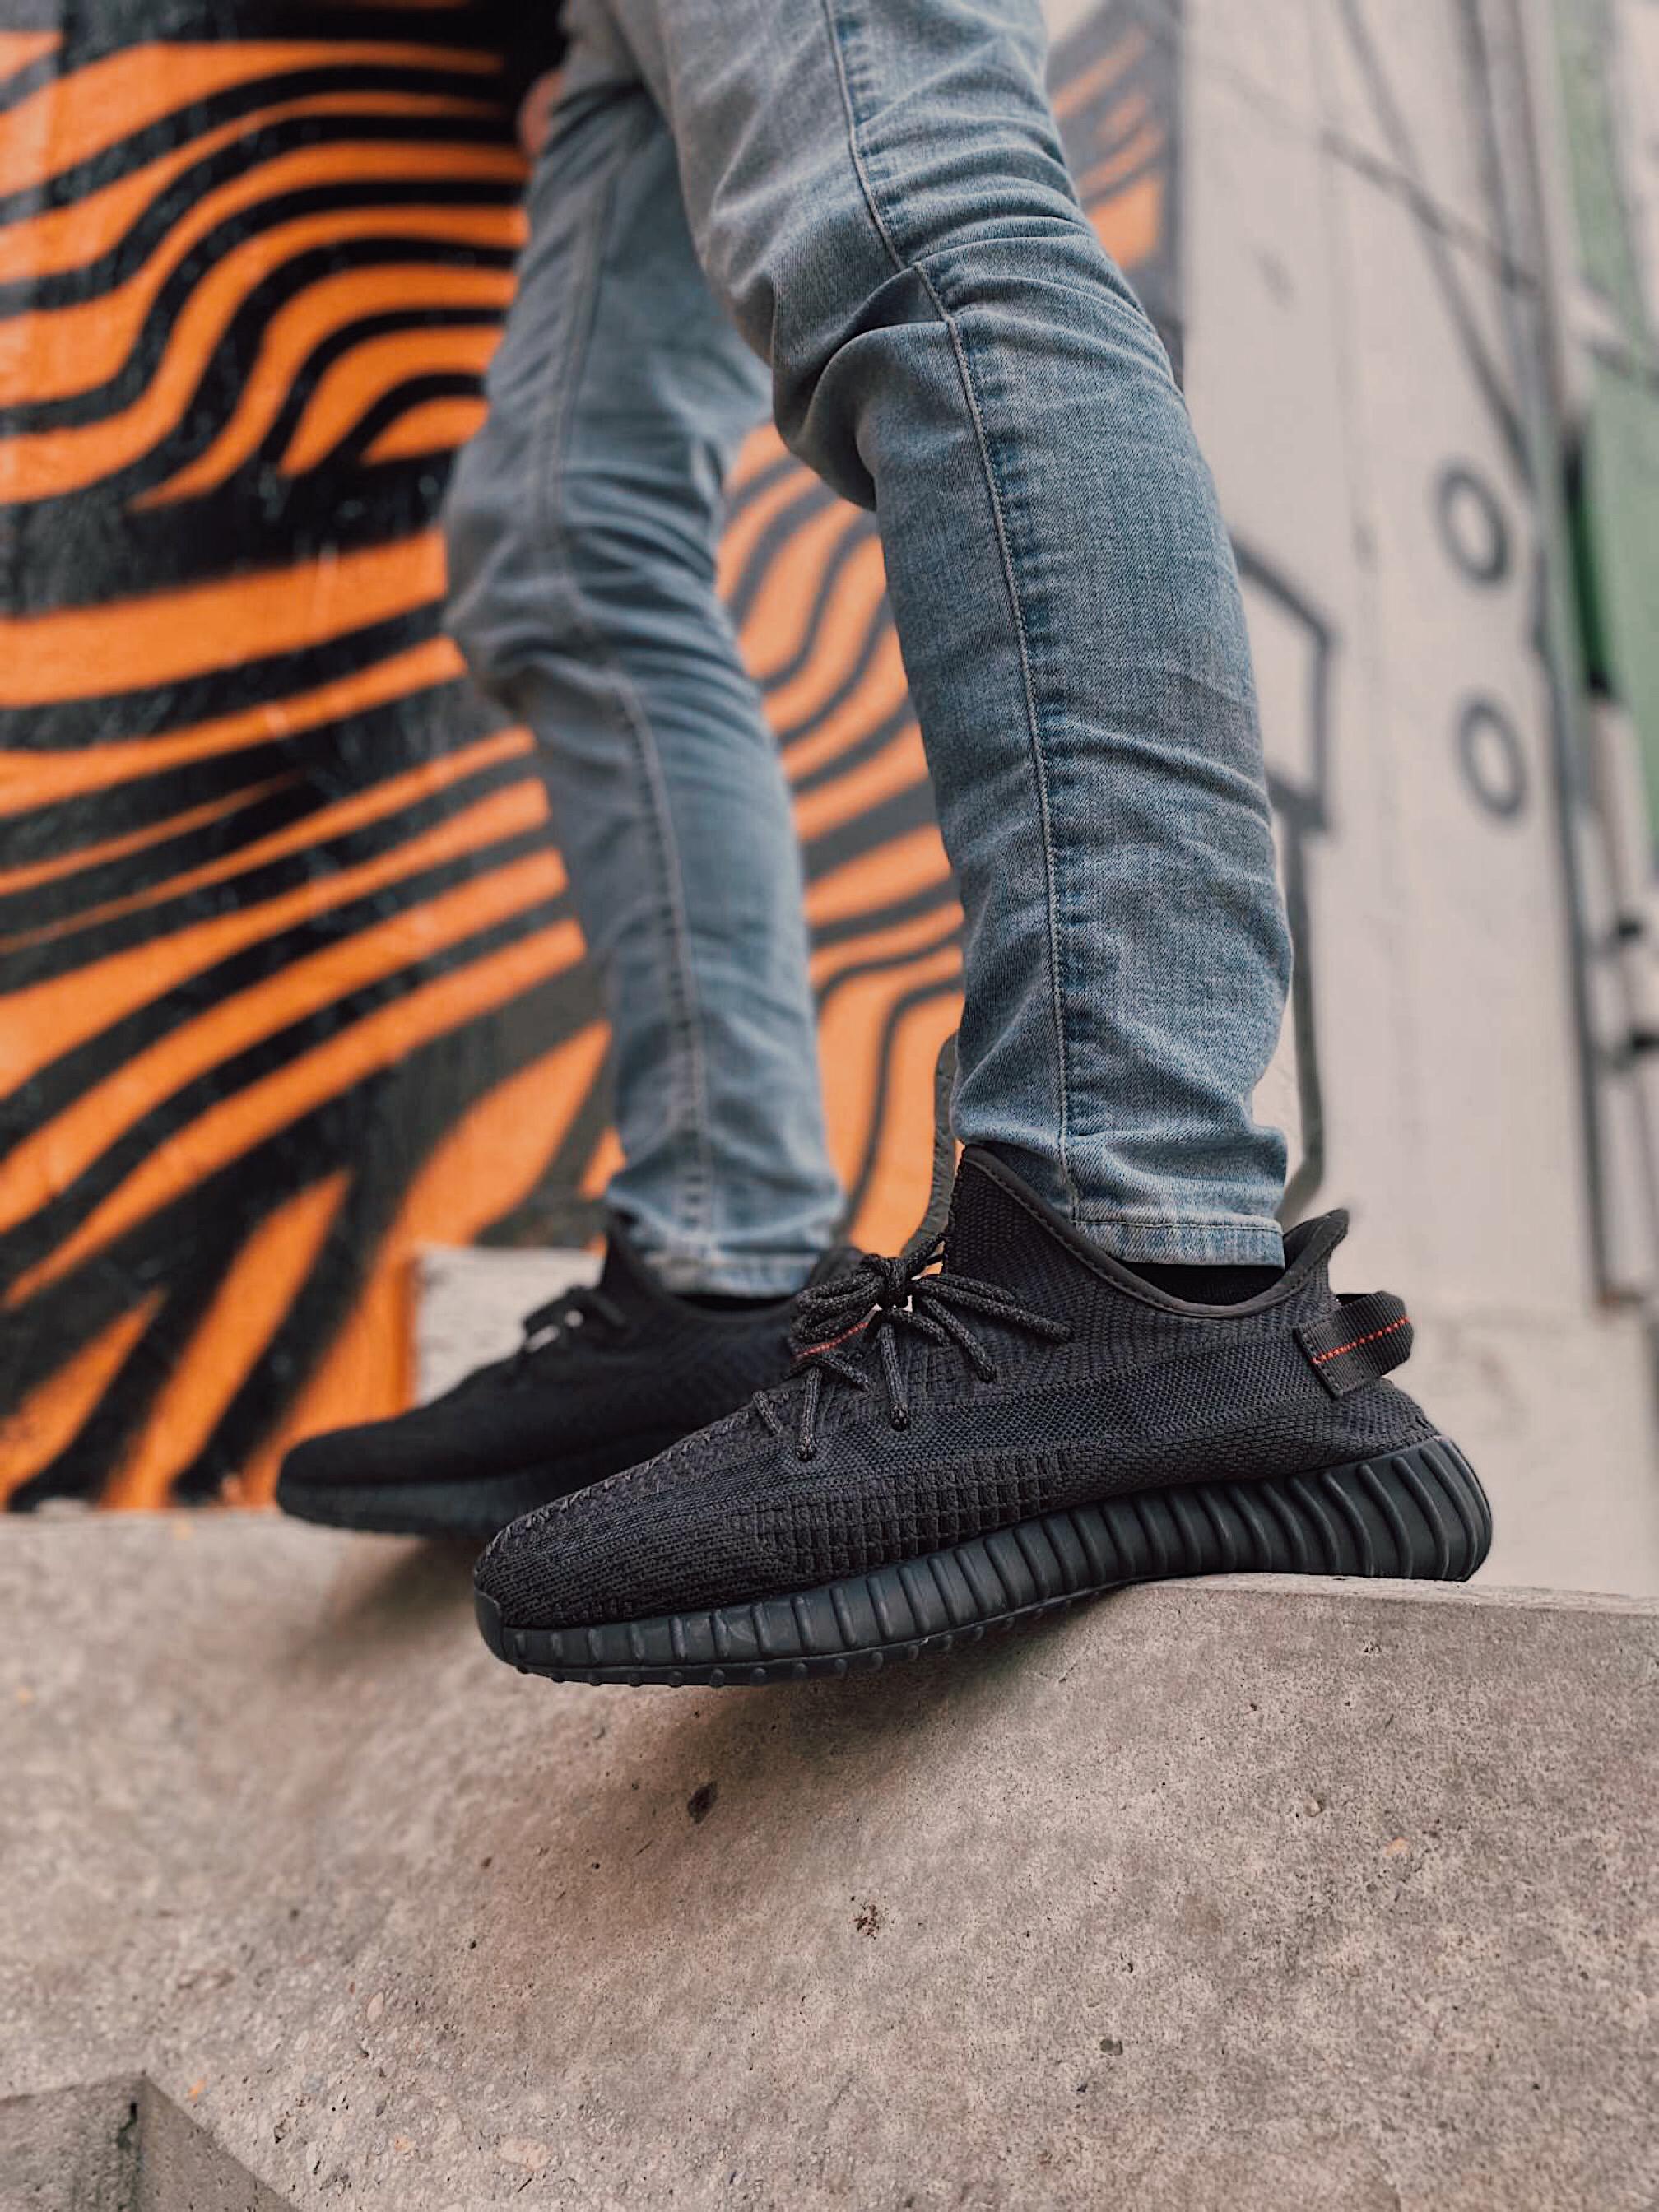 adidas yeezy boost 350 v2 black non reflective